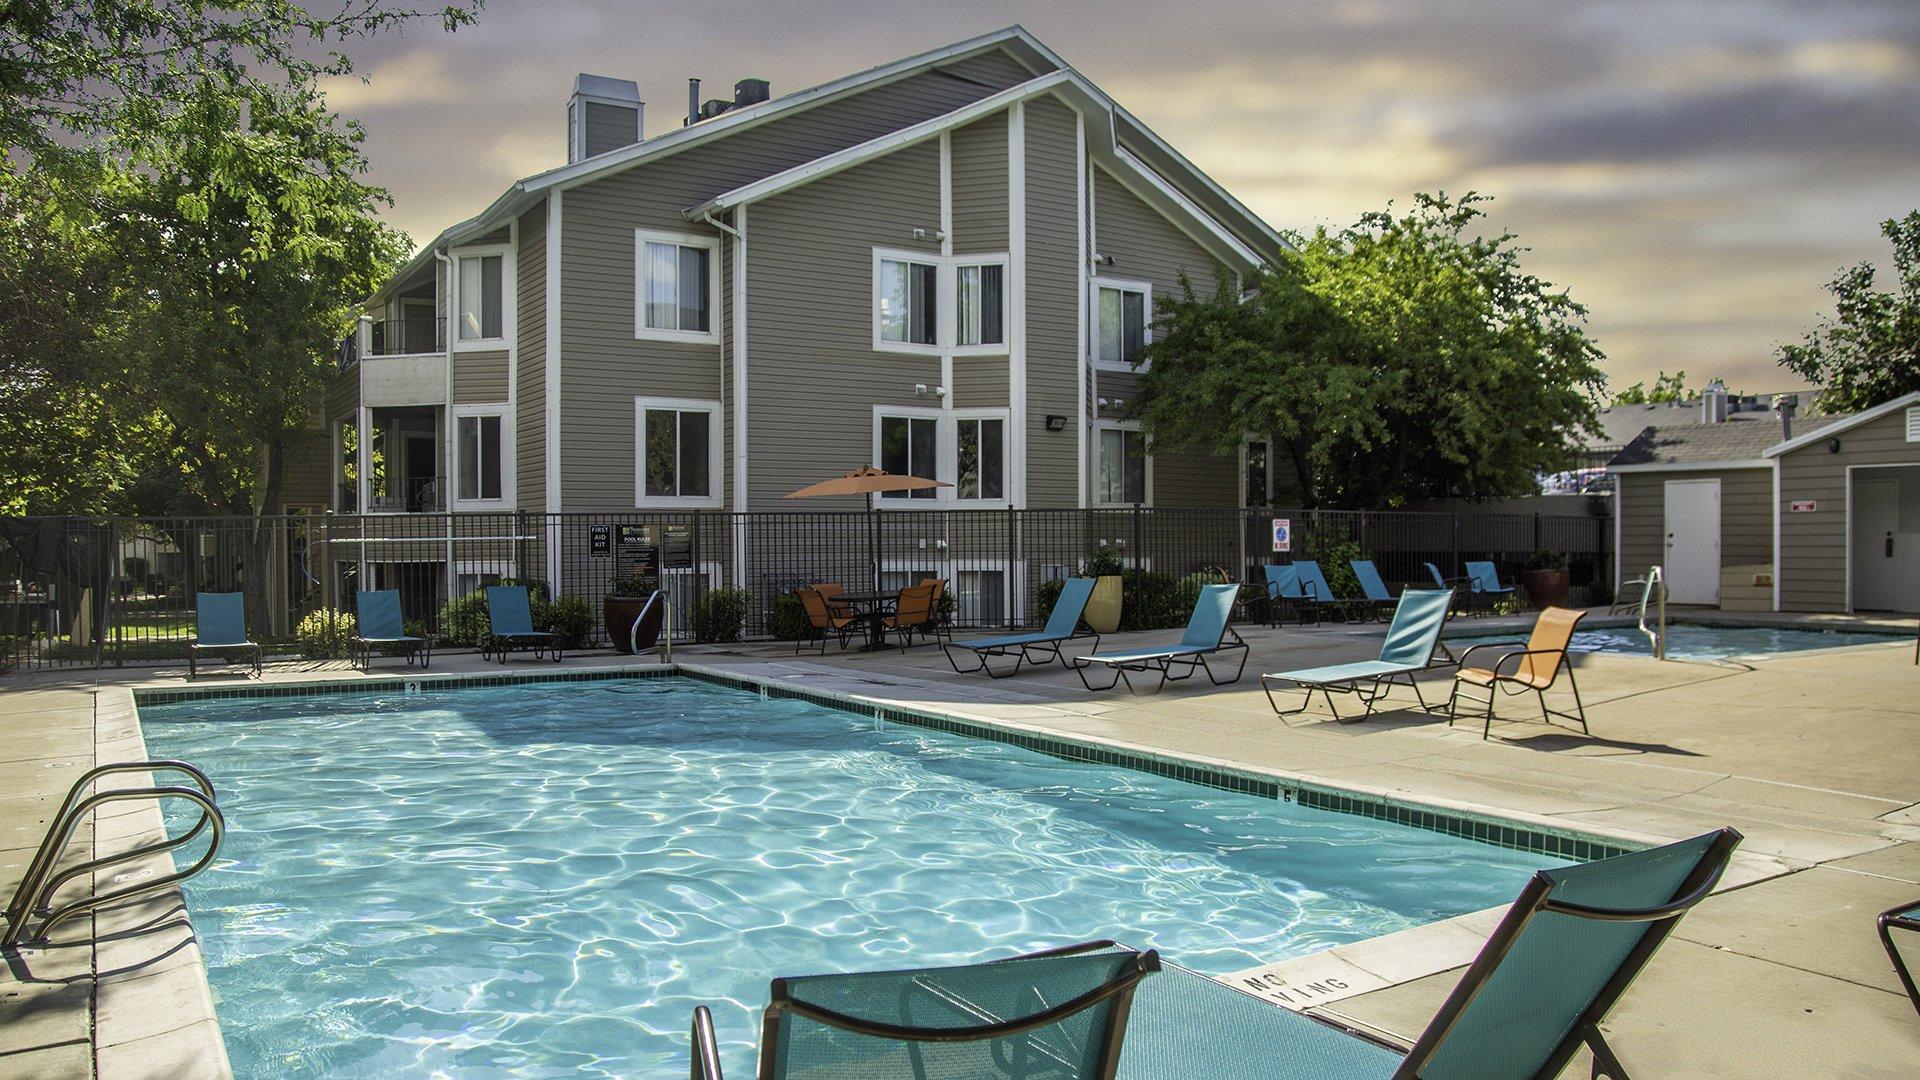 salt lake city apartments apartments in salt lake city ut